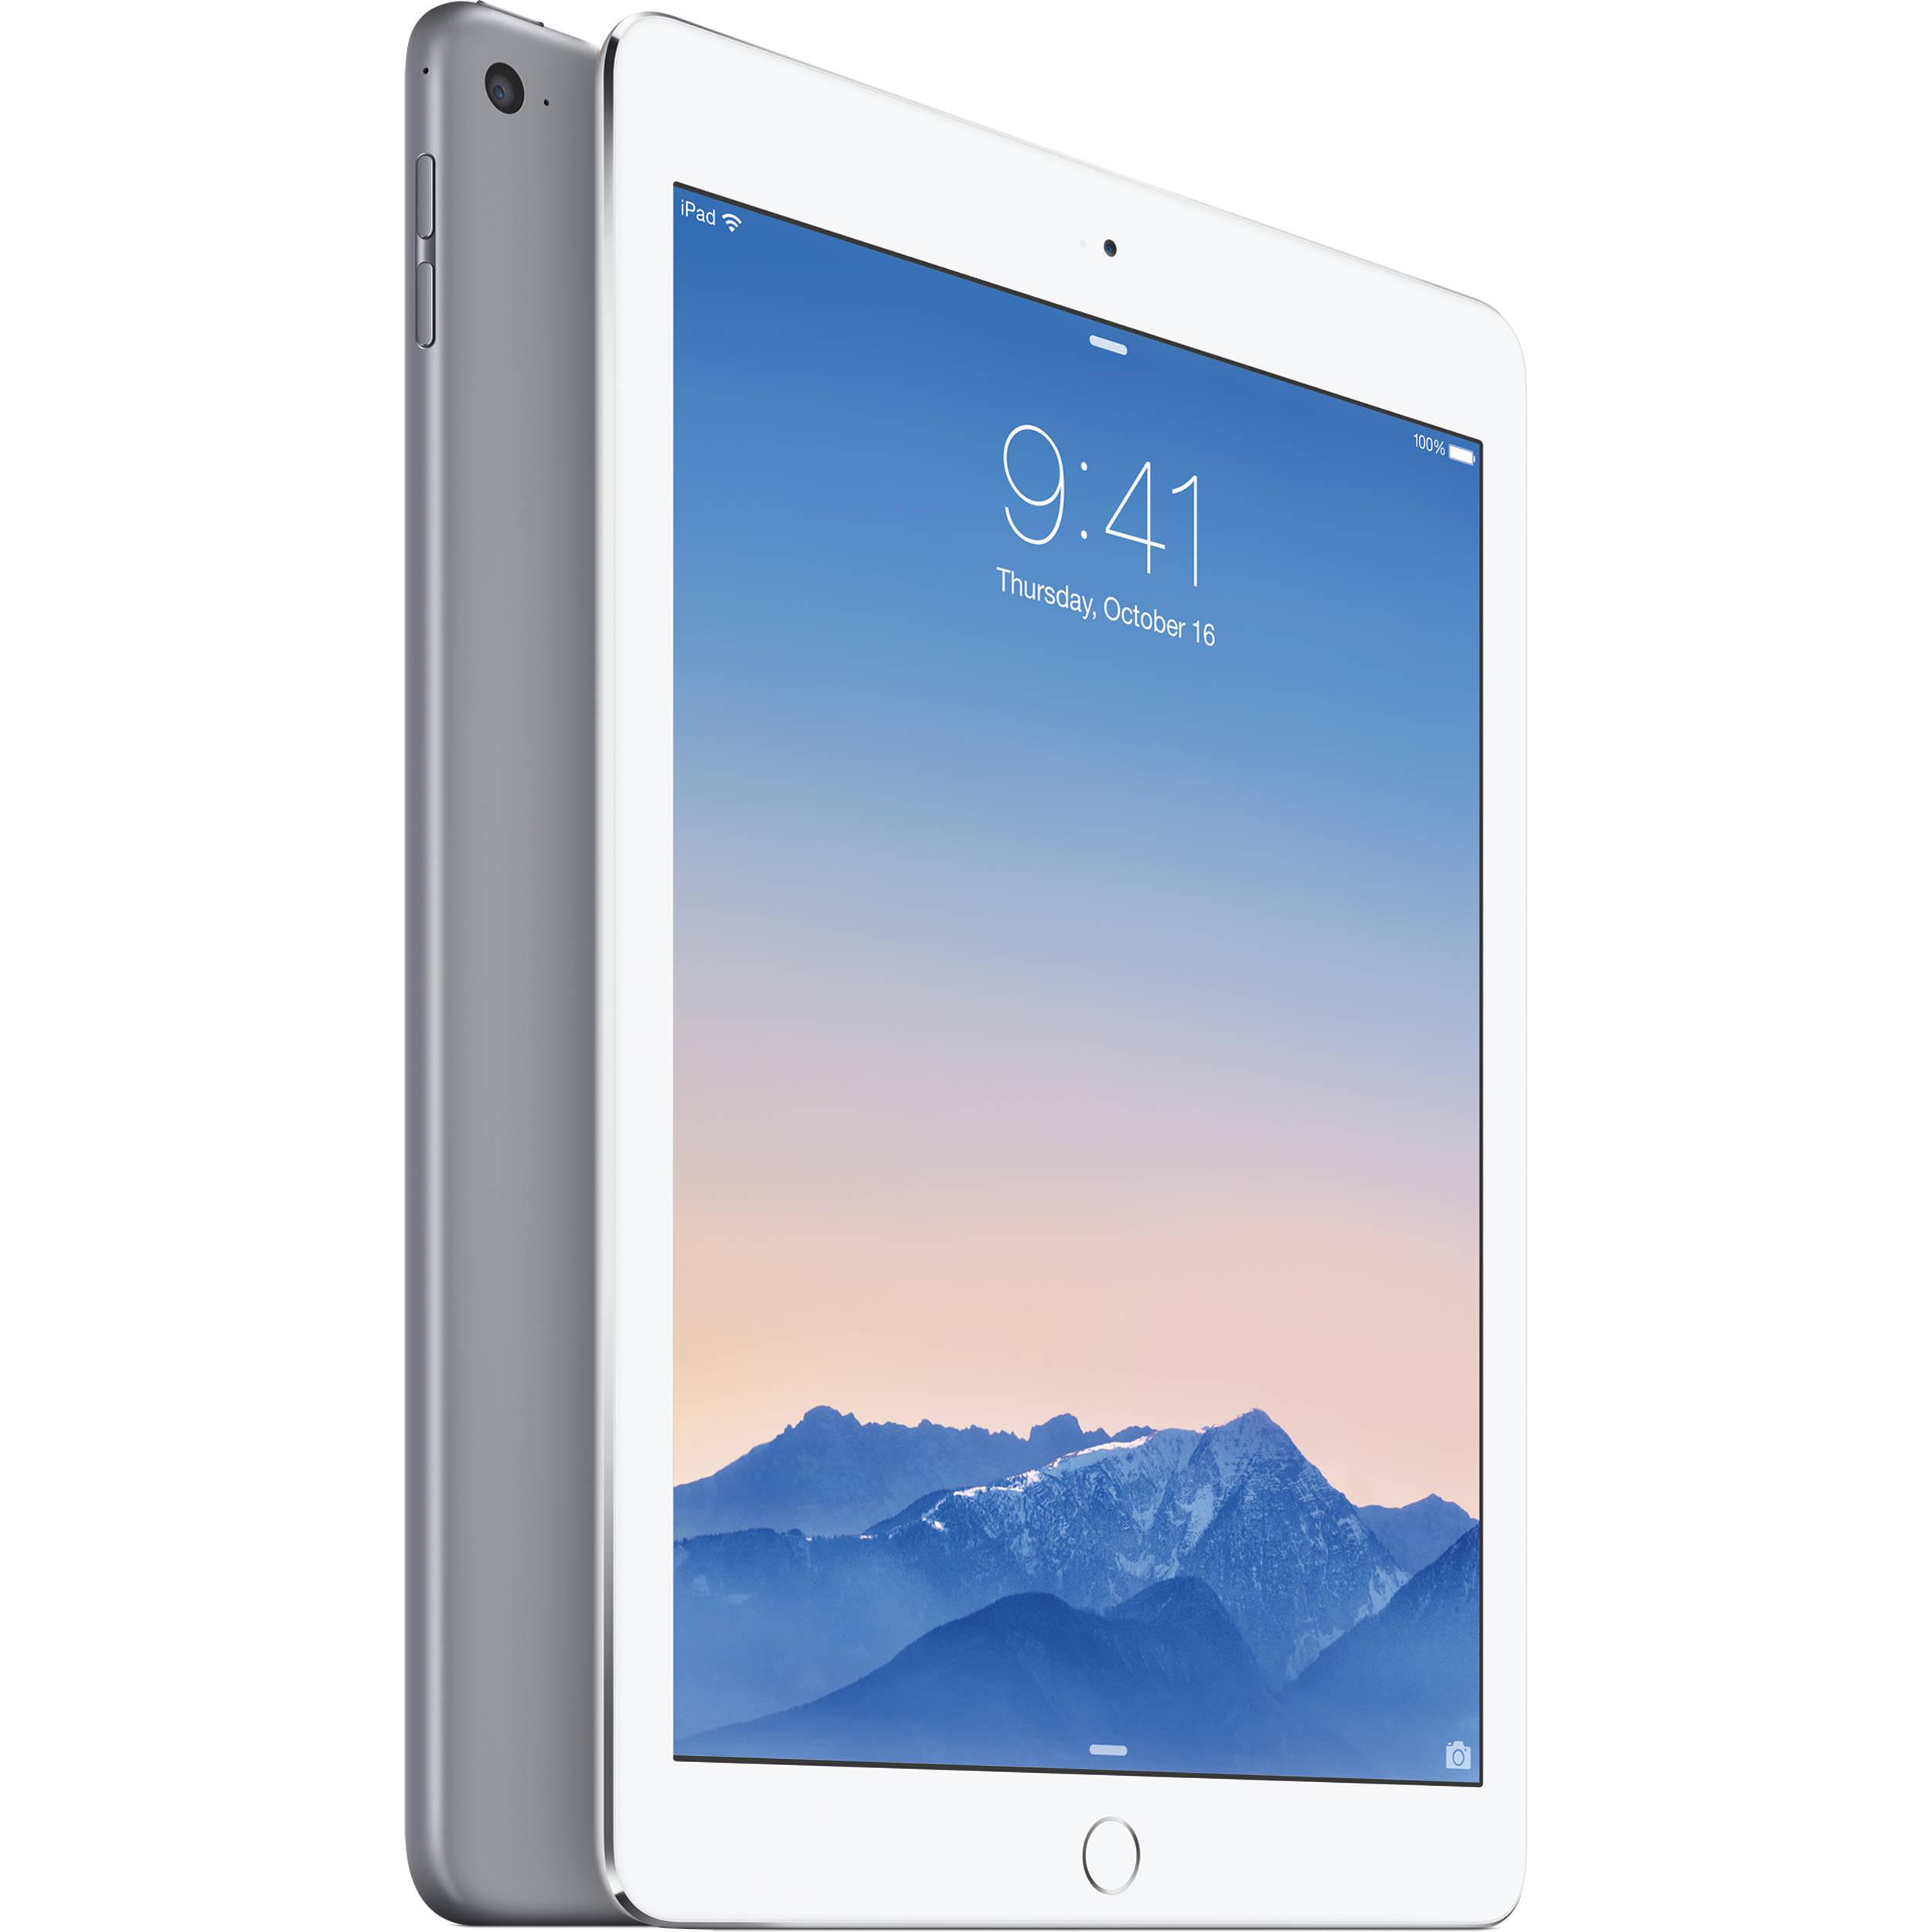 apple 128gb ipad air 2 verizon space gray mh312ll a verizon. Black Bedroom Furniture Sets. Home Design Ideas